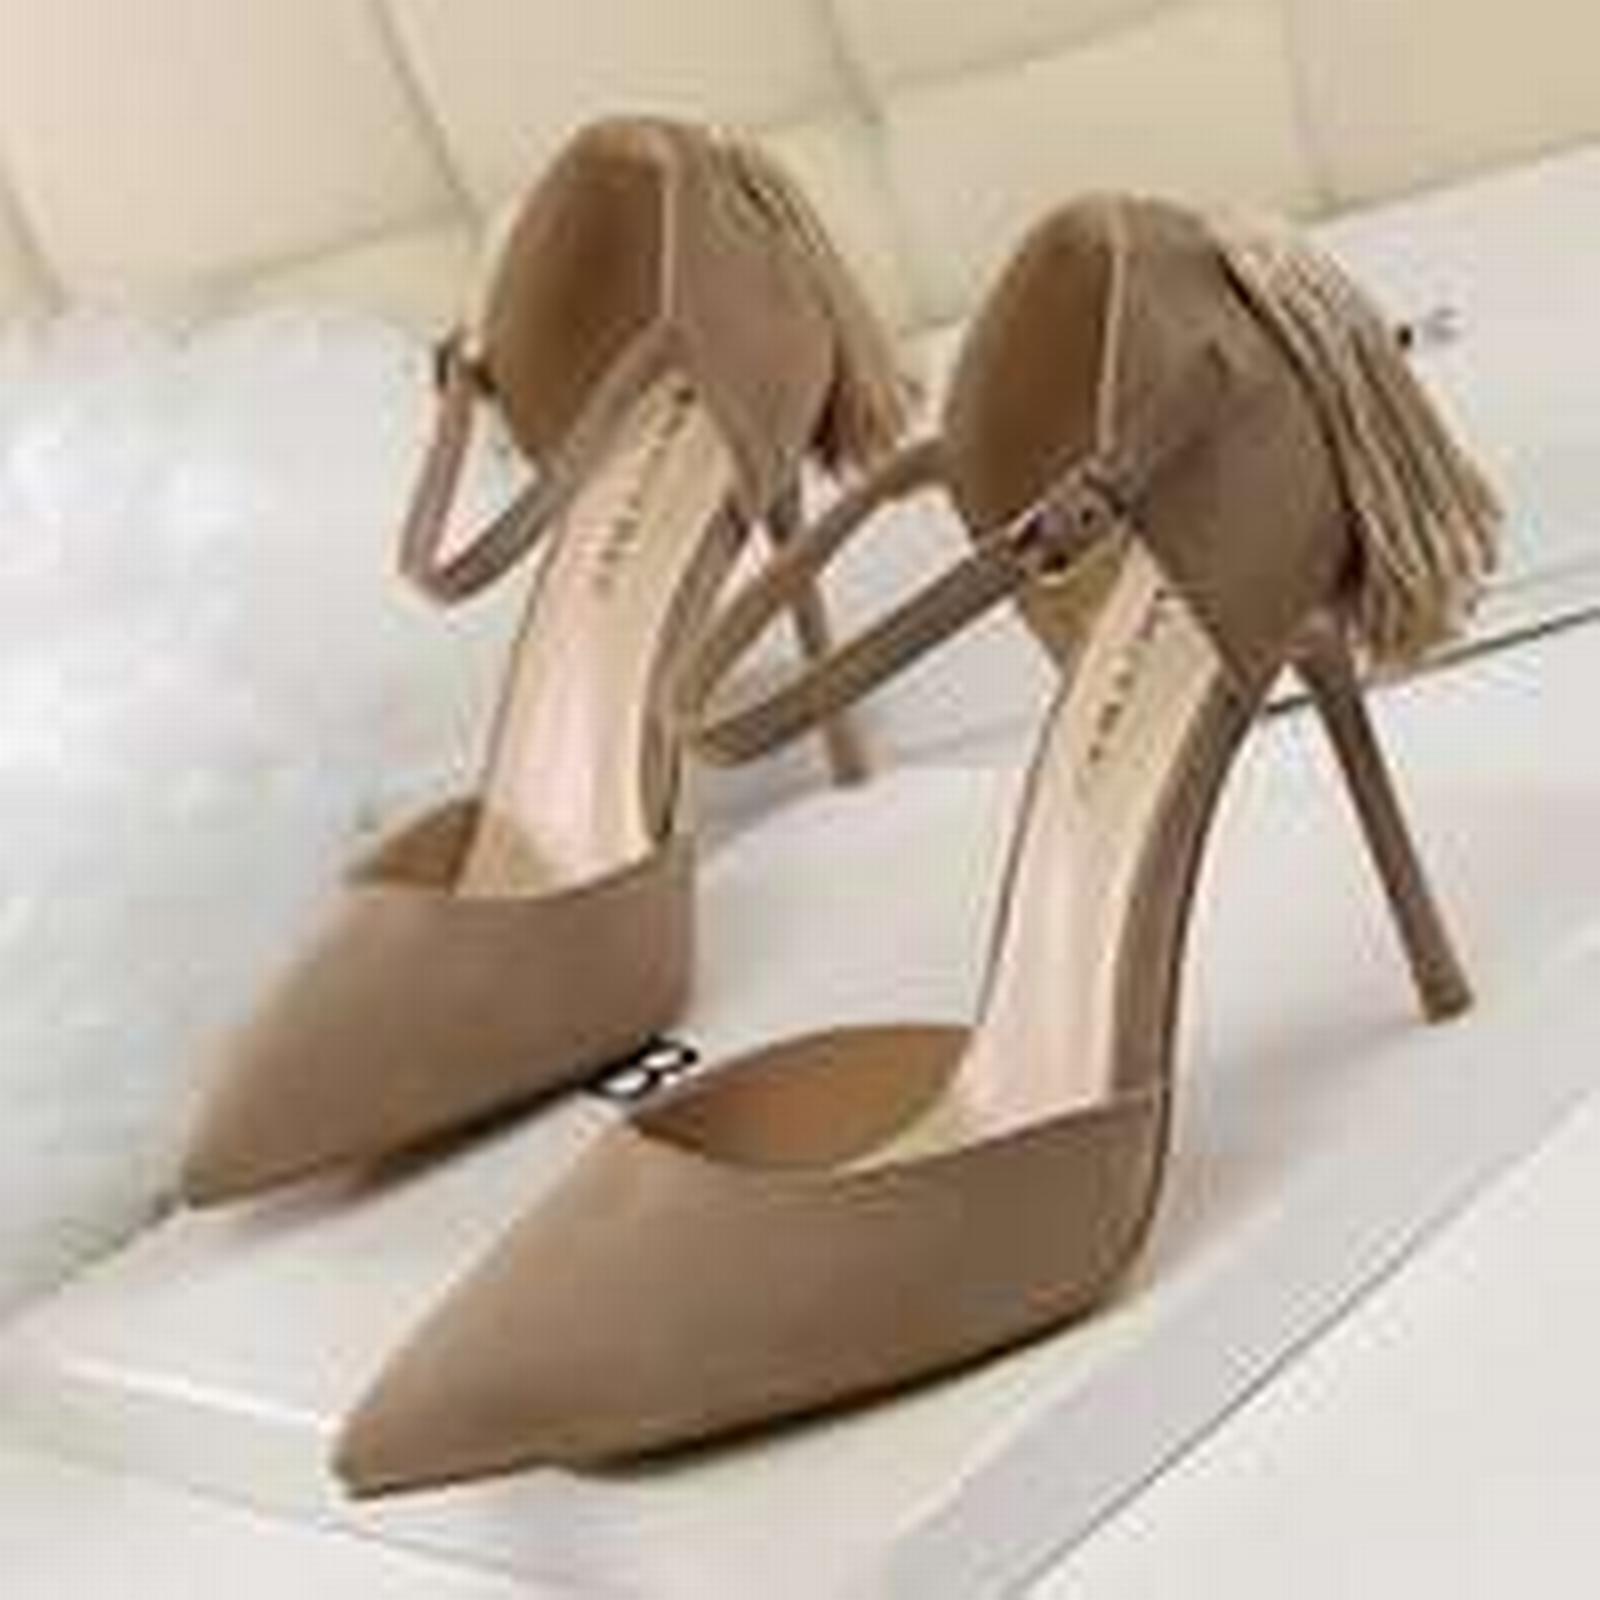 Bonanza ankle (Global) pp257 elegant pointy ankle Bonanza sandals w big fringe, nubuck, US Size 4-8, khaki 2ed385